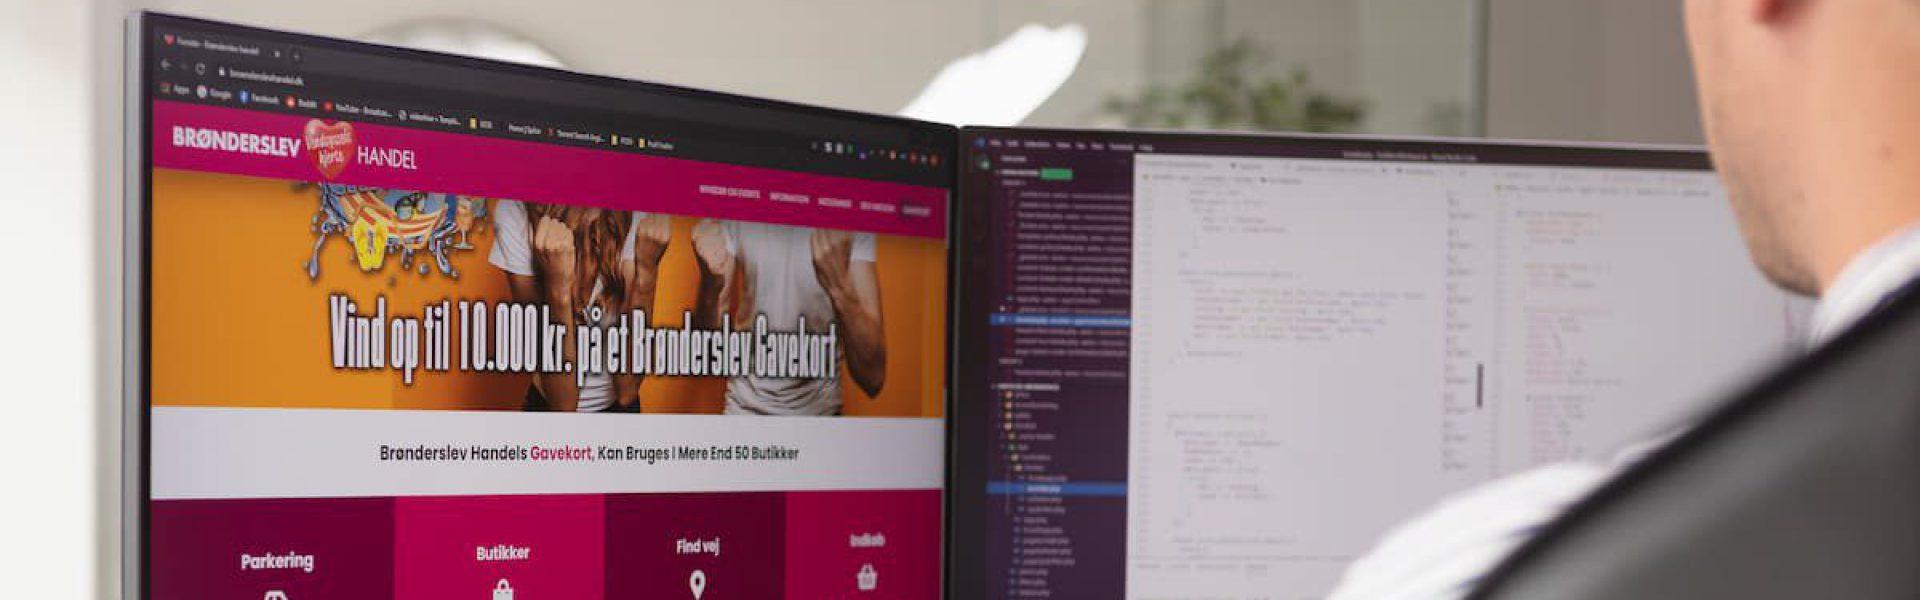 Mand sidder ved computer